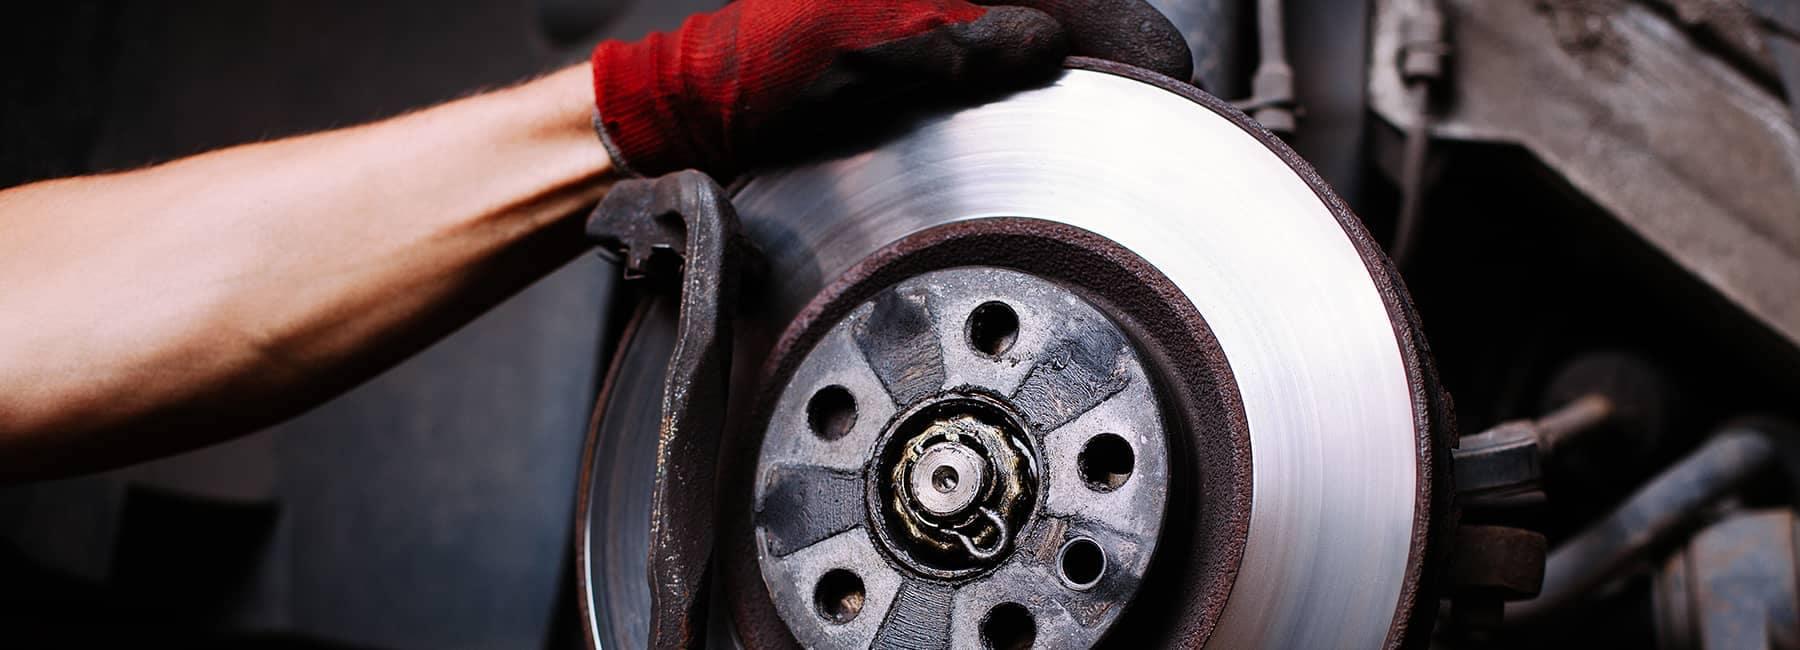 Mechanic diagnosing vehicle